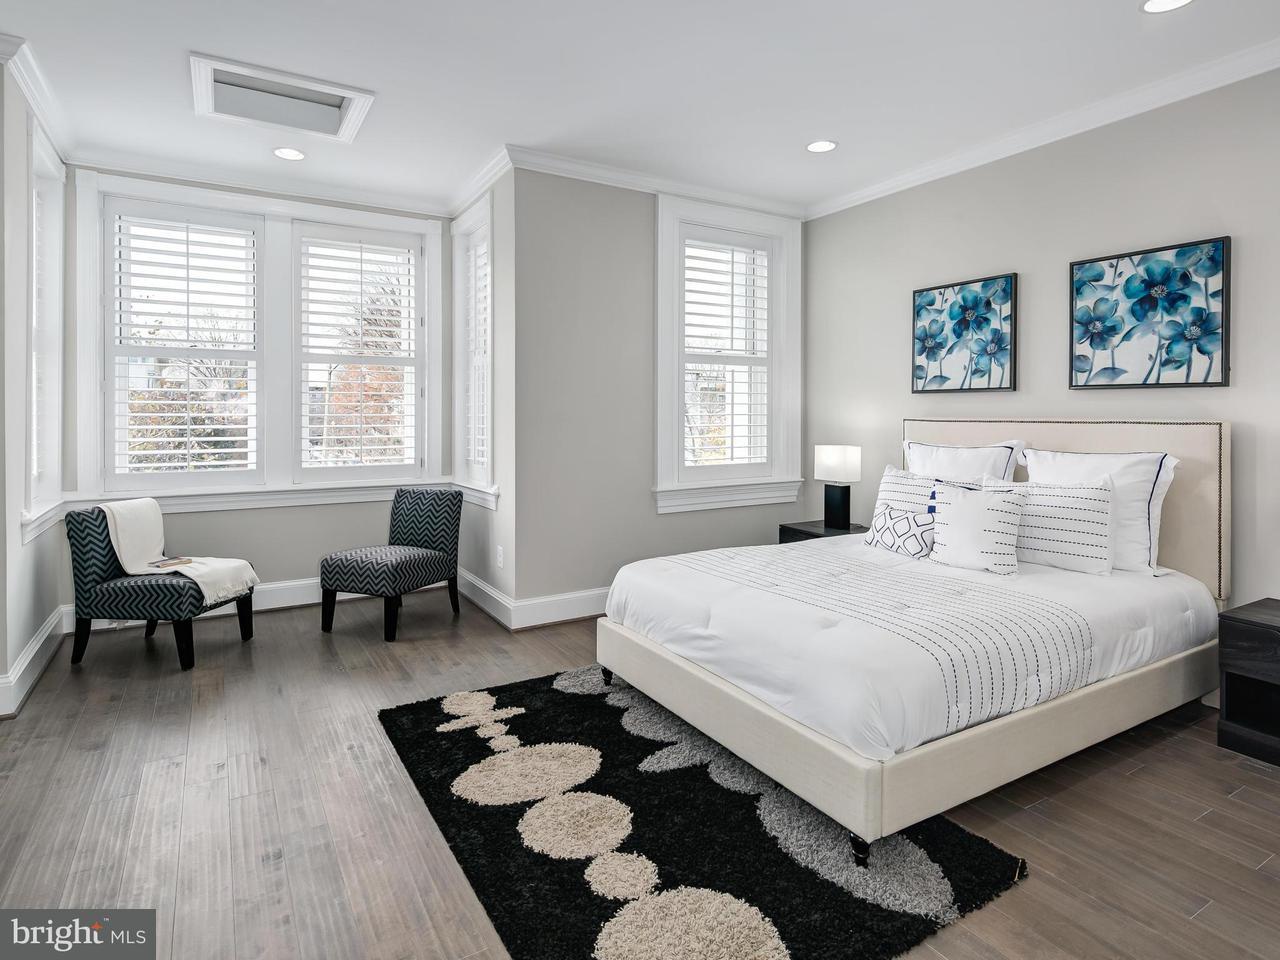 Additional photo for property listing at 227 12th St Ne 227 12th St Ne Washington, コロンビア特別区 20002 アメリカ合衆国